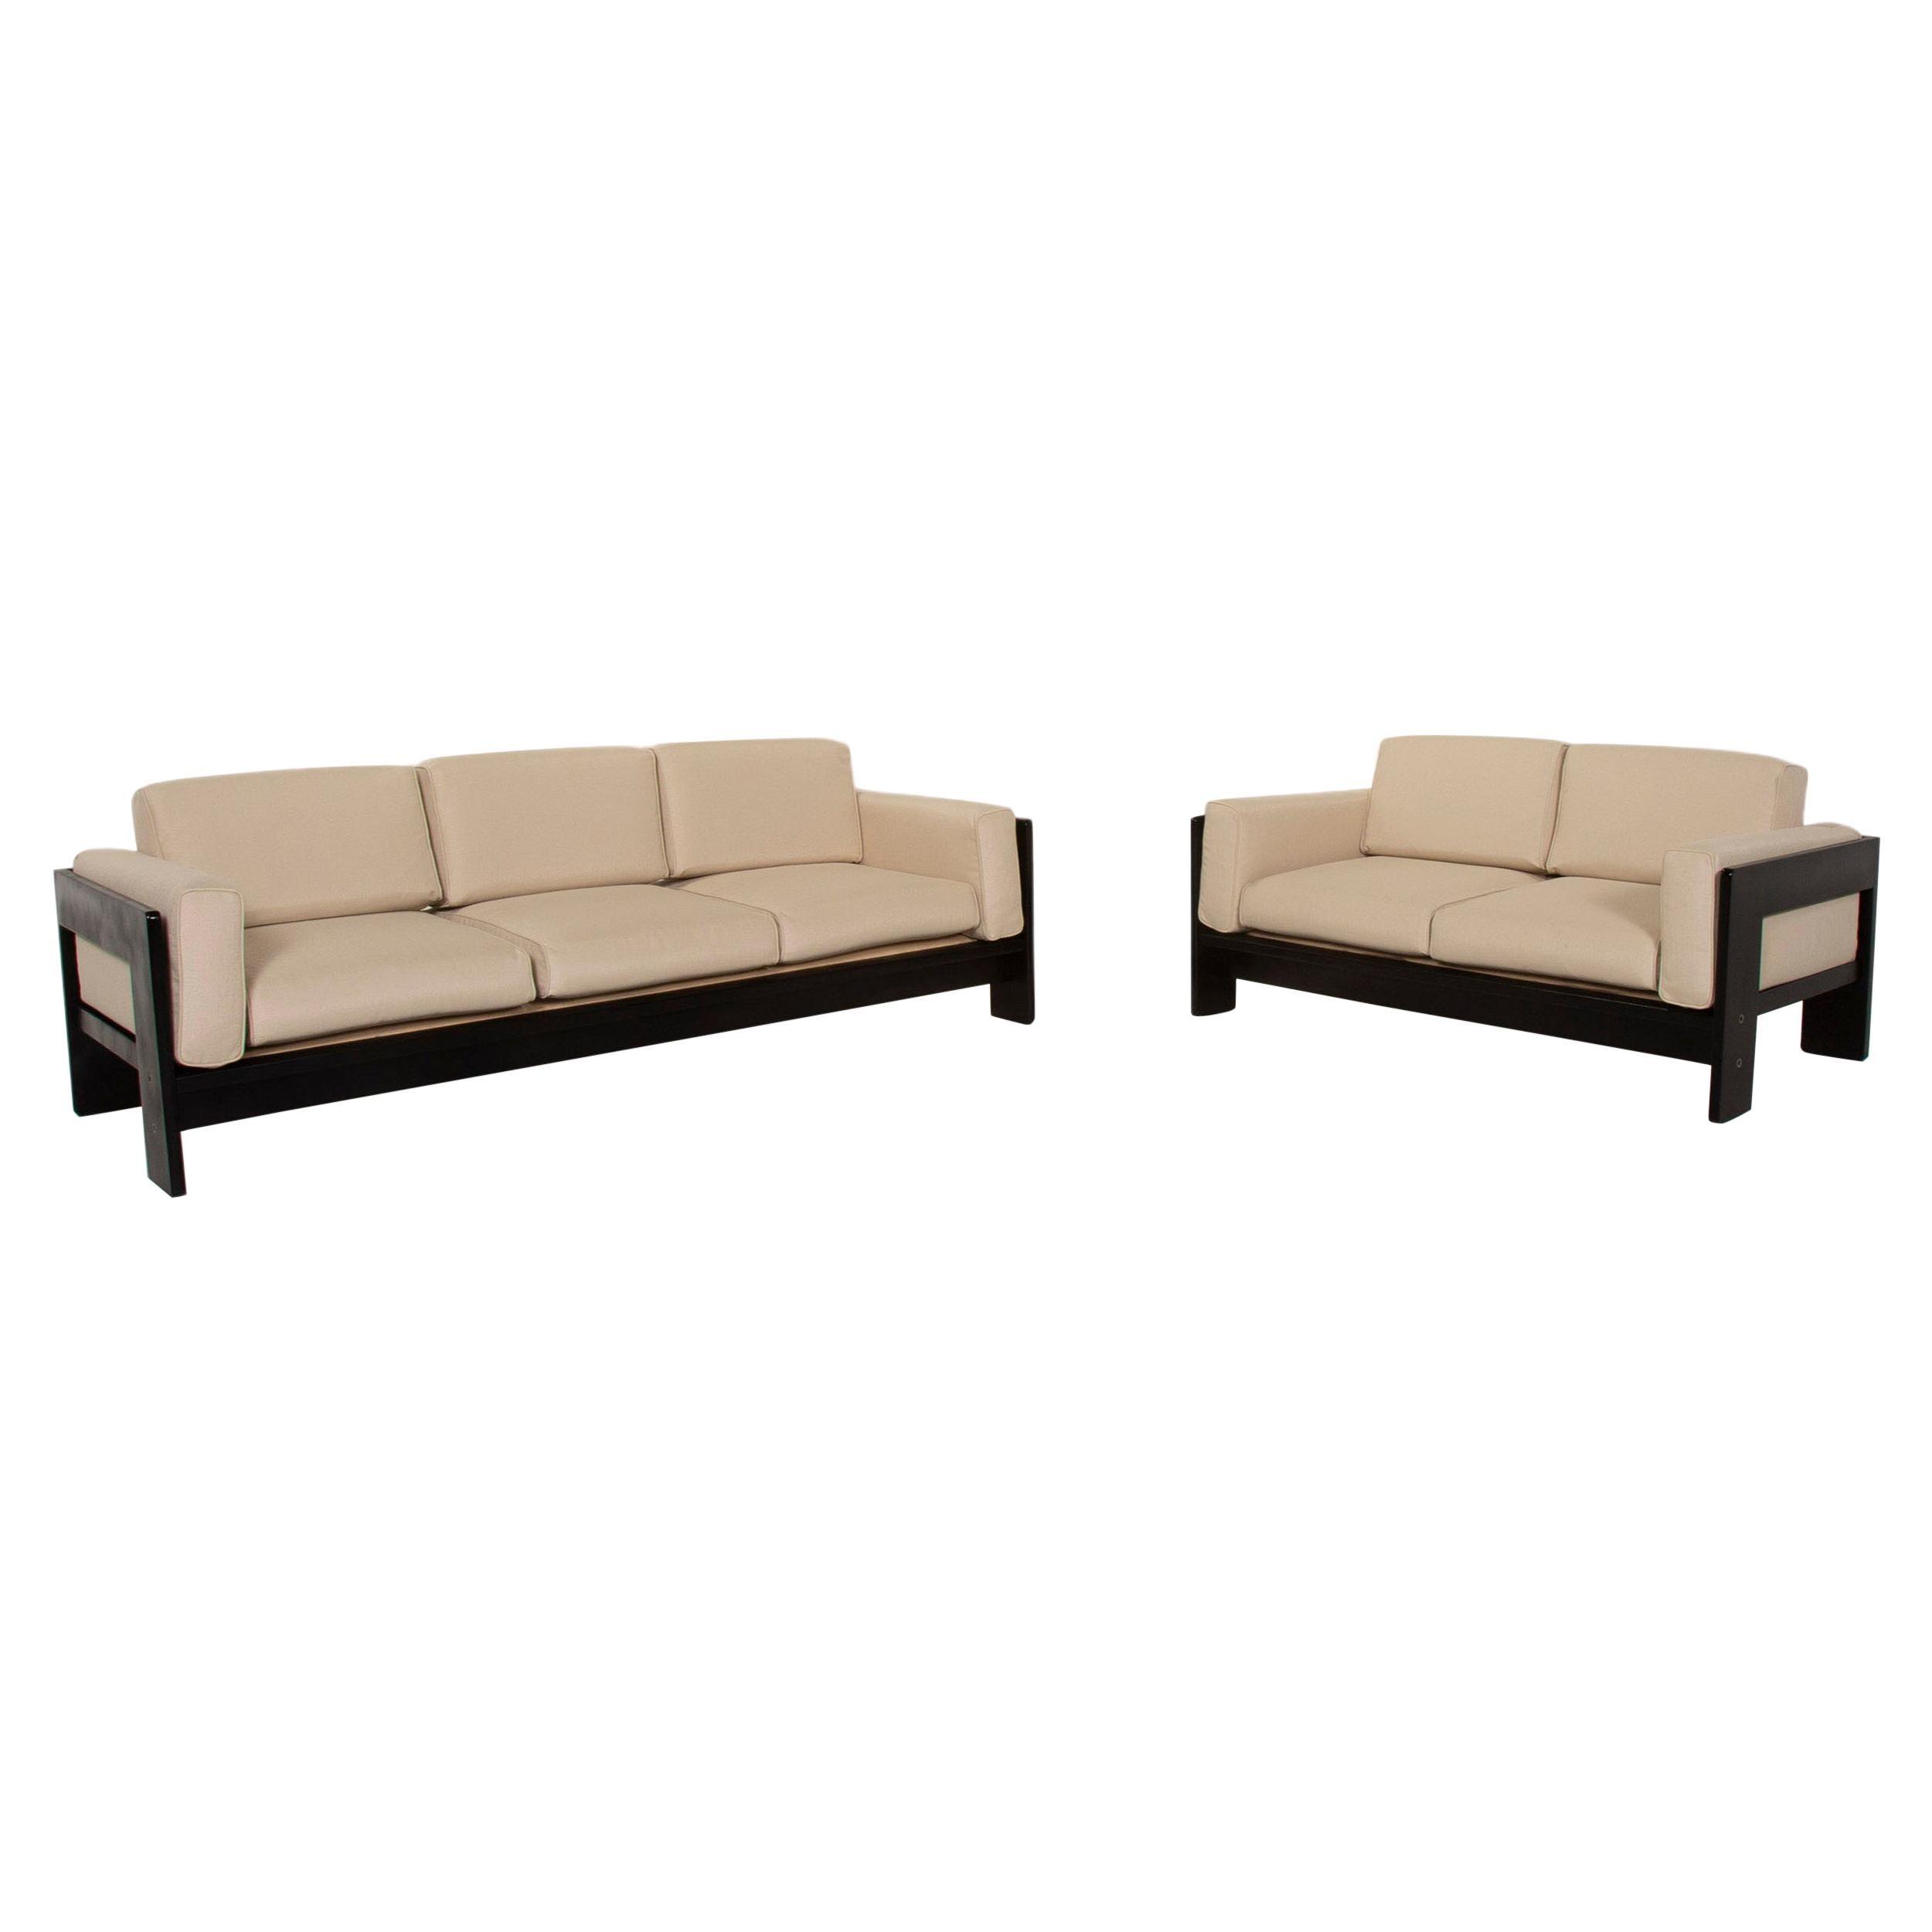 Knoll International Bastiano Fabric Sofa Set Cream 1x Three-Seater 1x